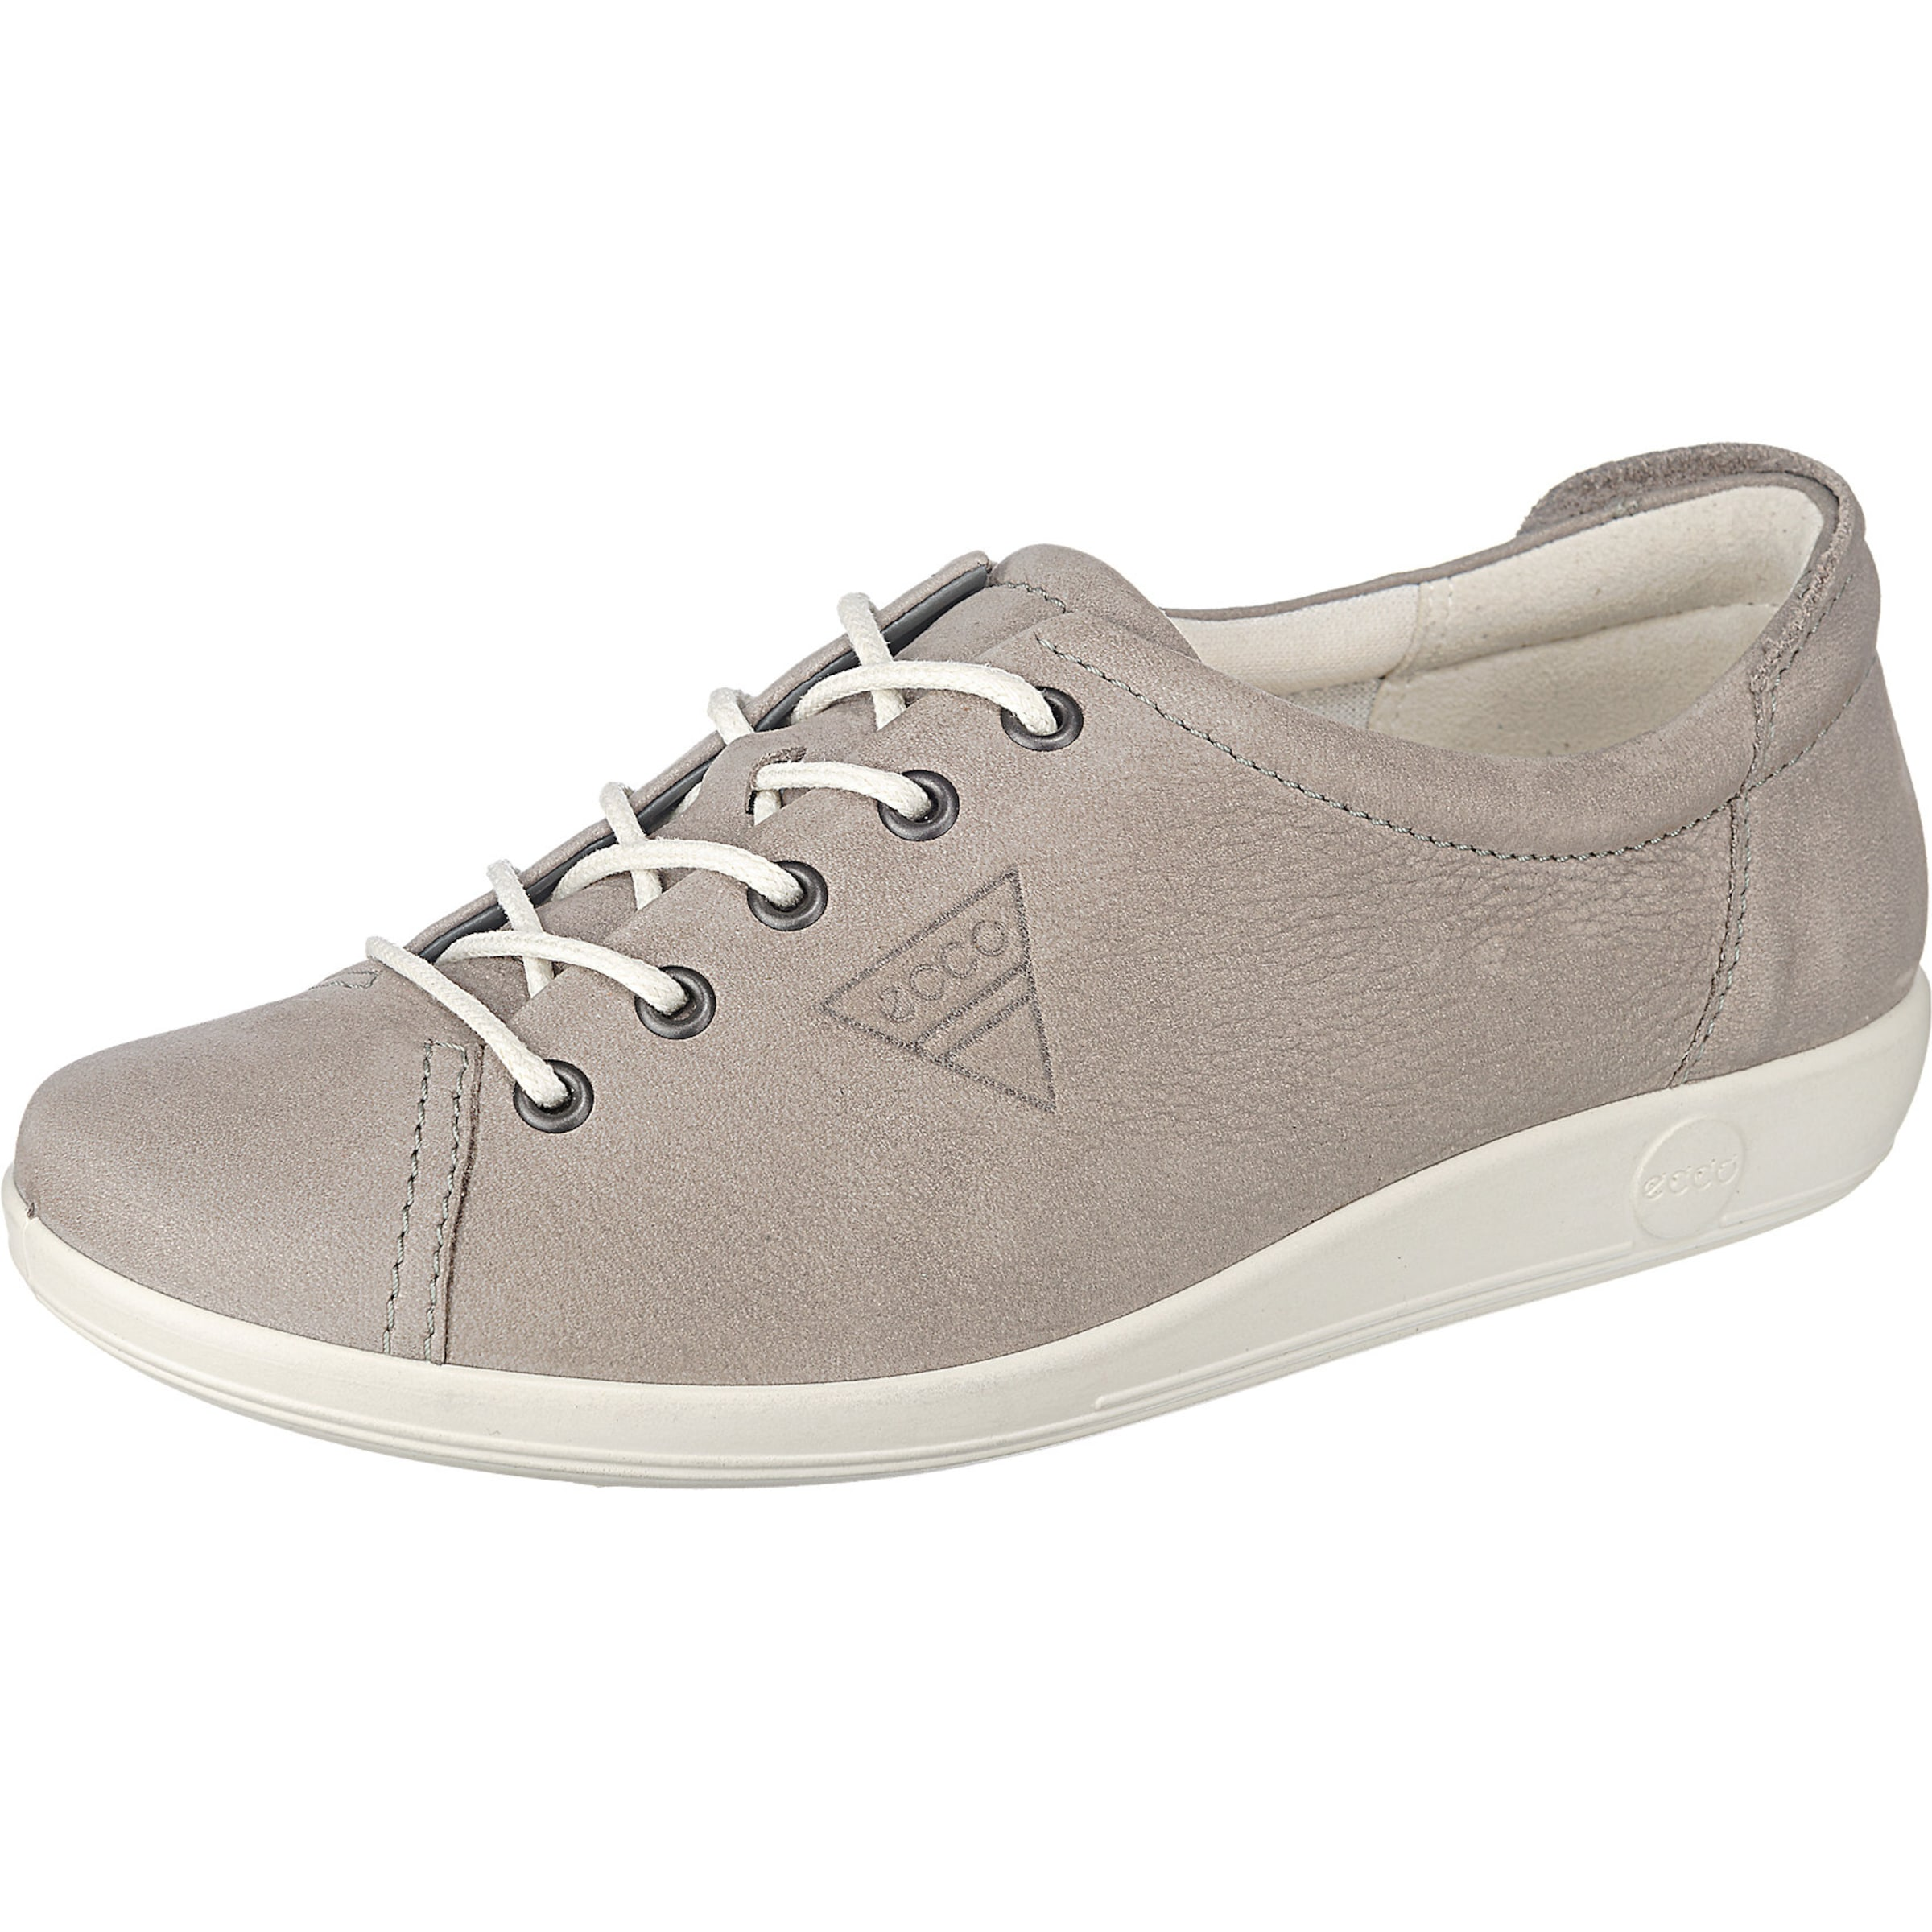 Haltbare Mode billige Schuhe ECCO | 'Soft 2.0' Halbschuhe Schuhe Gut getragene Schuhe